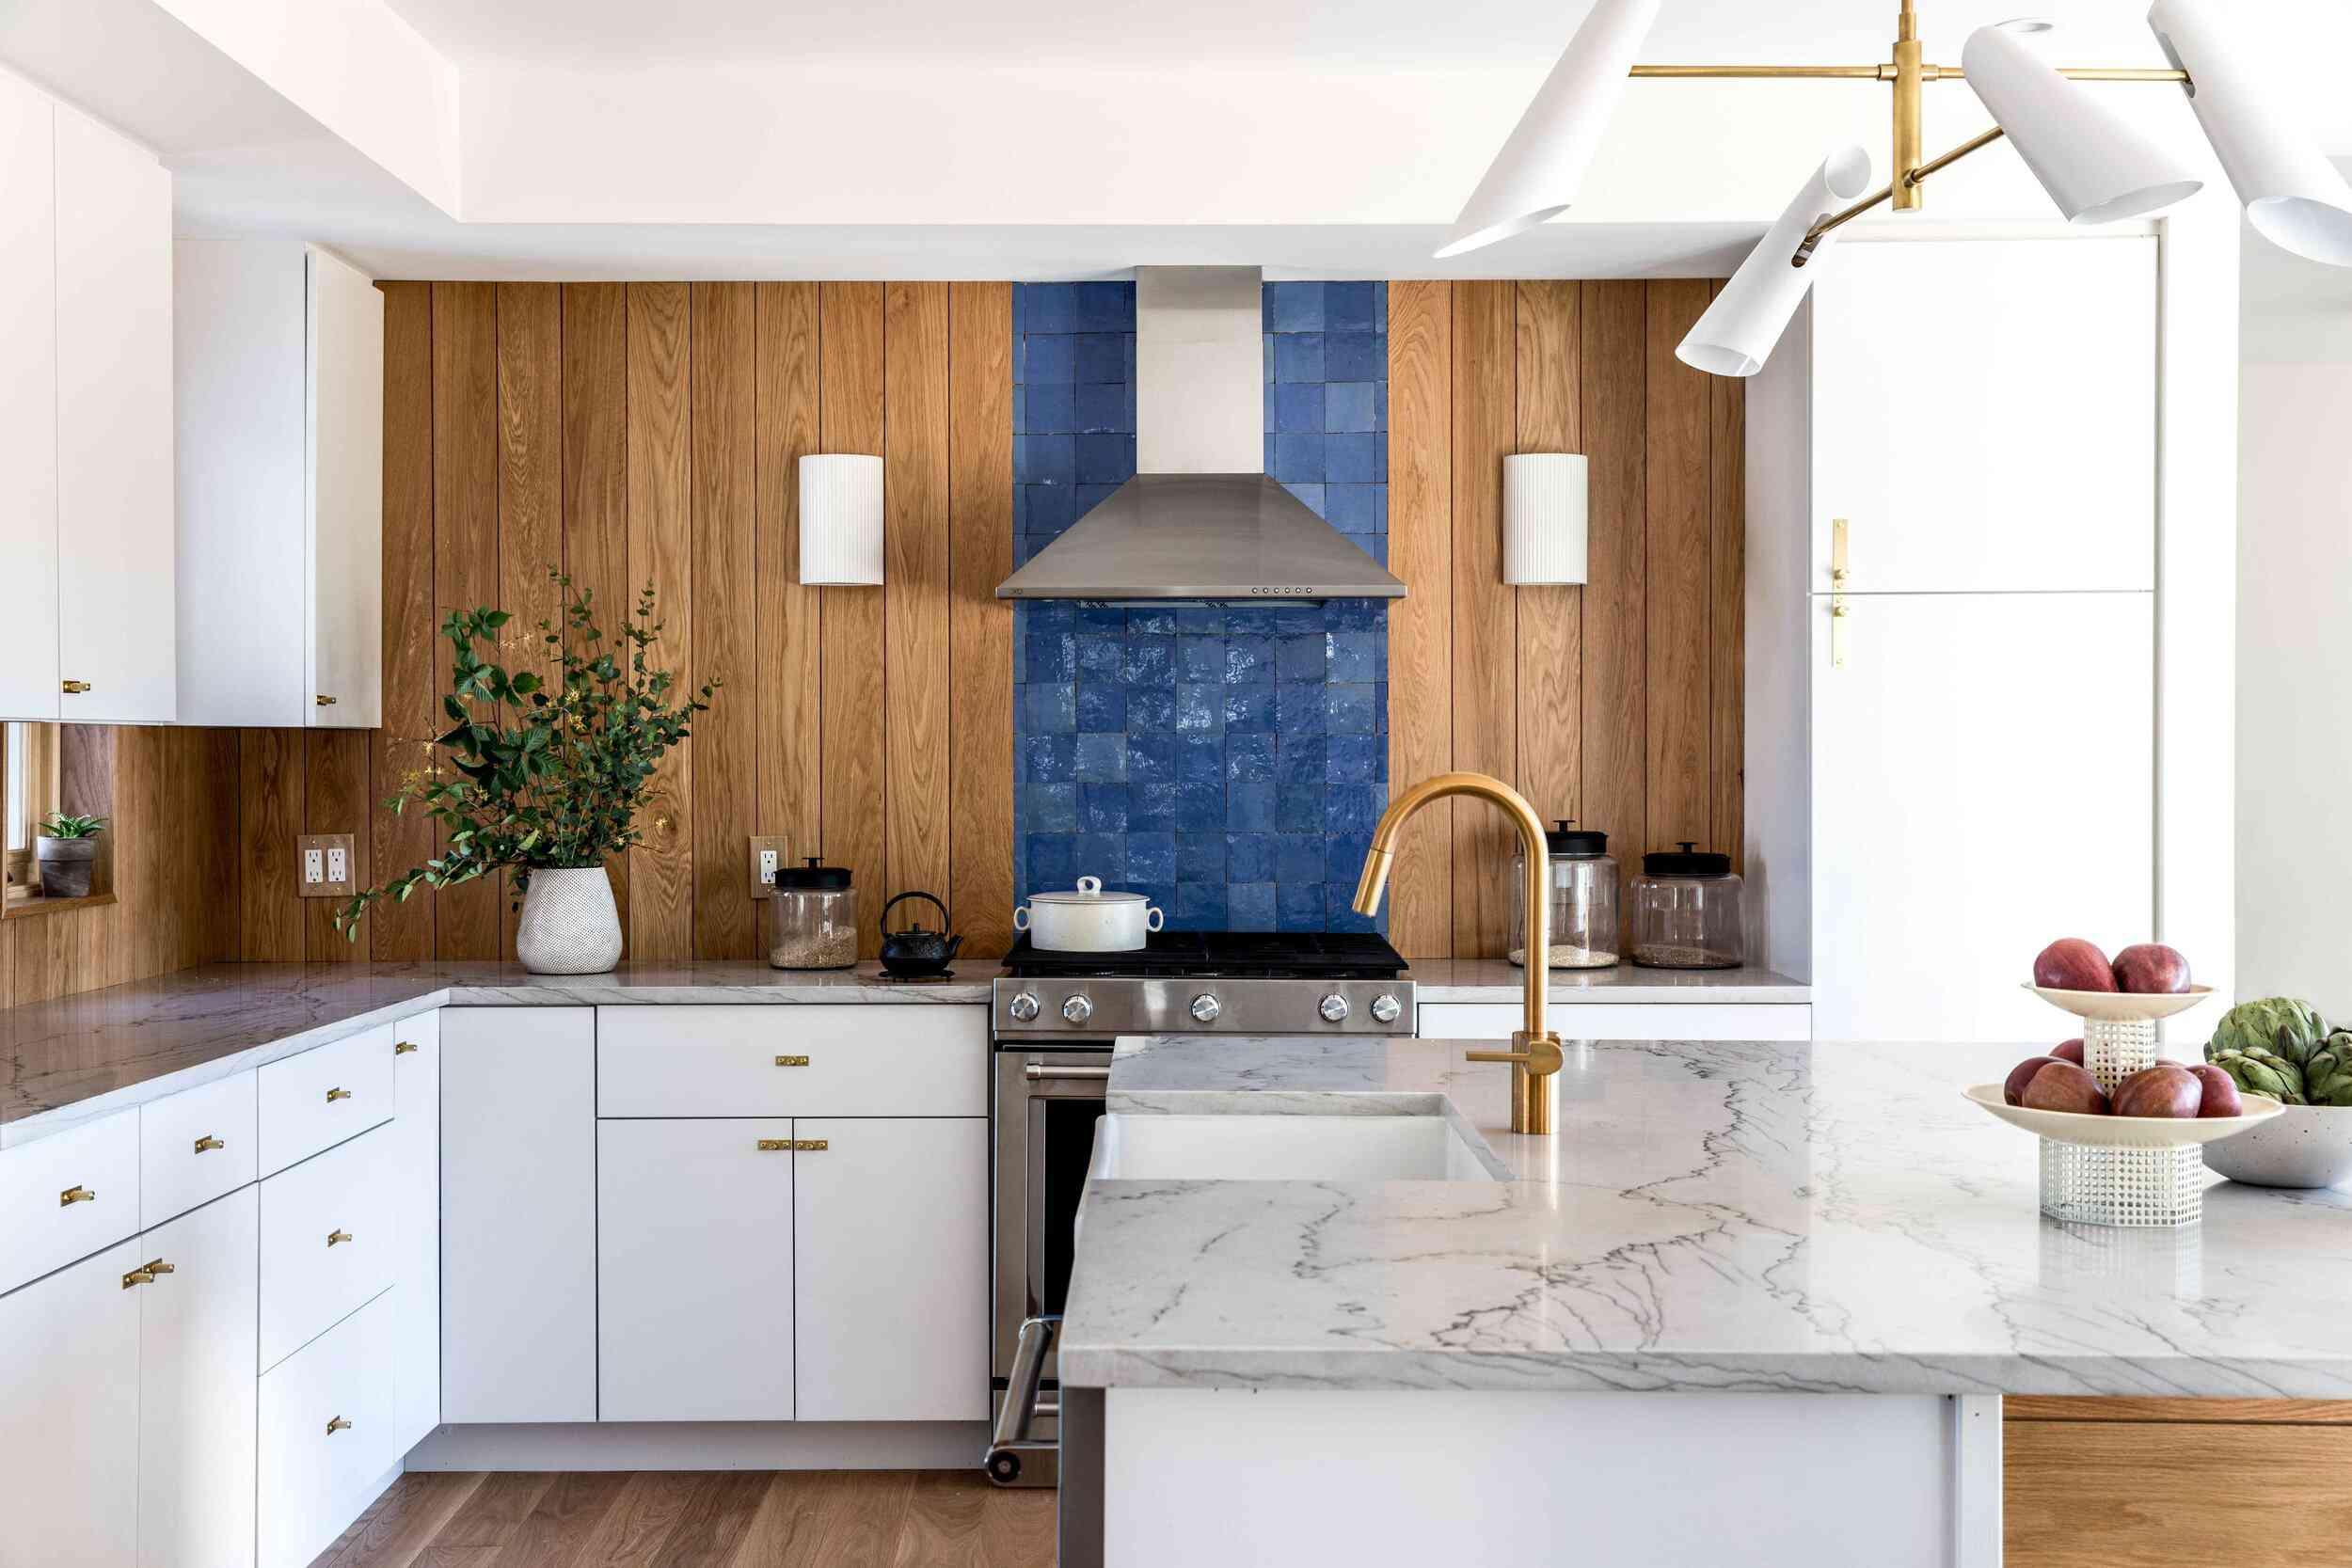 A wood-paneled kitchen with a bold blue backsplash